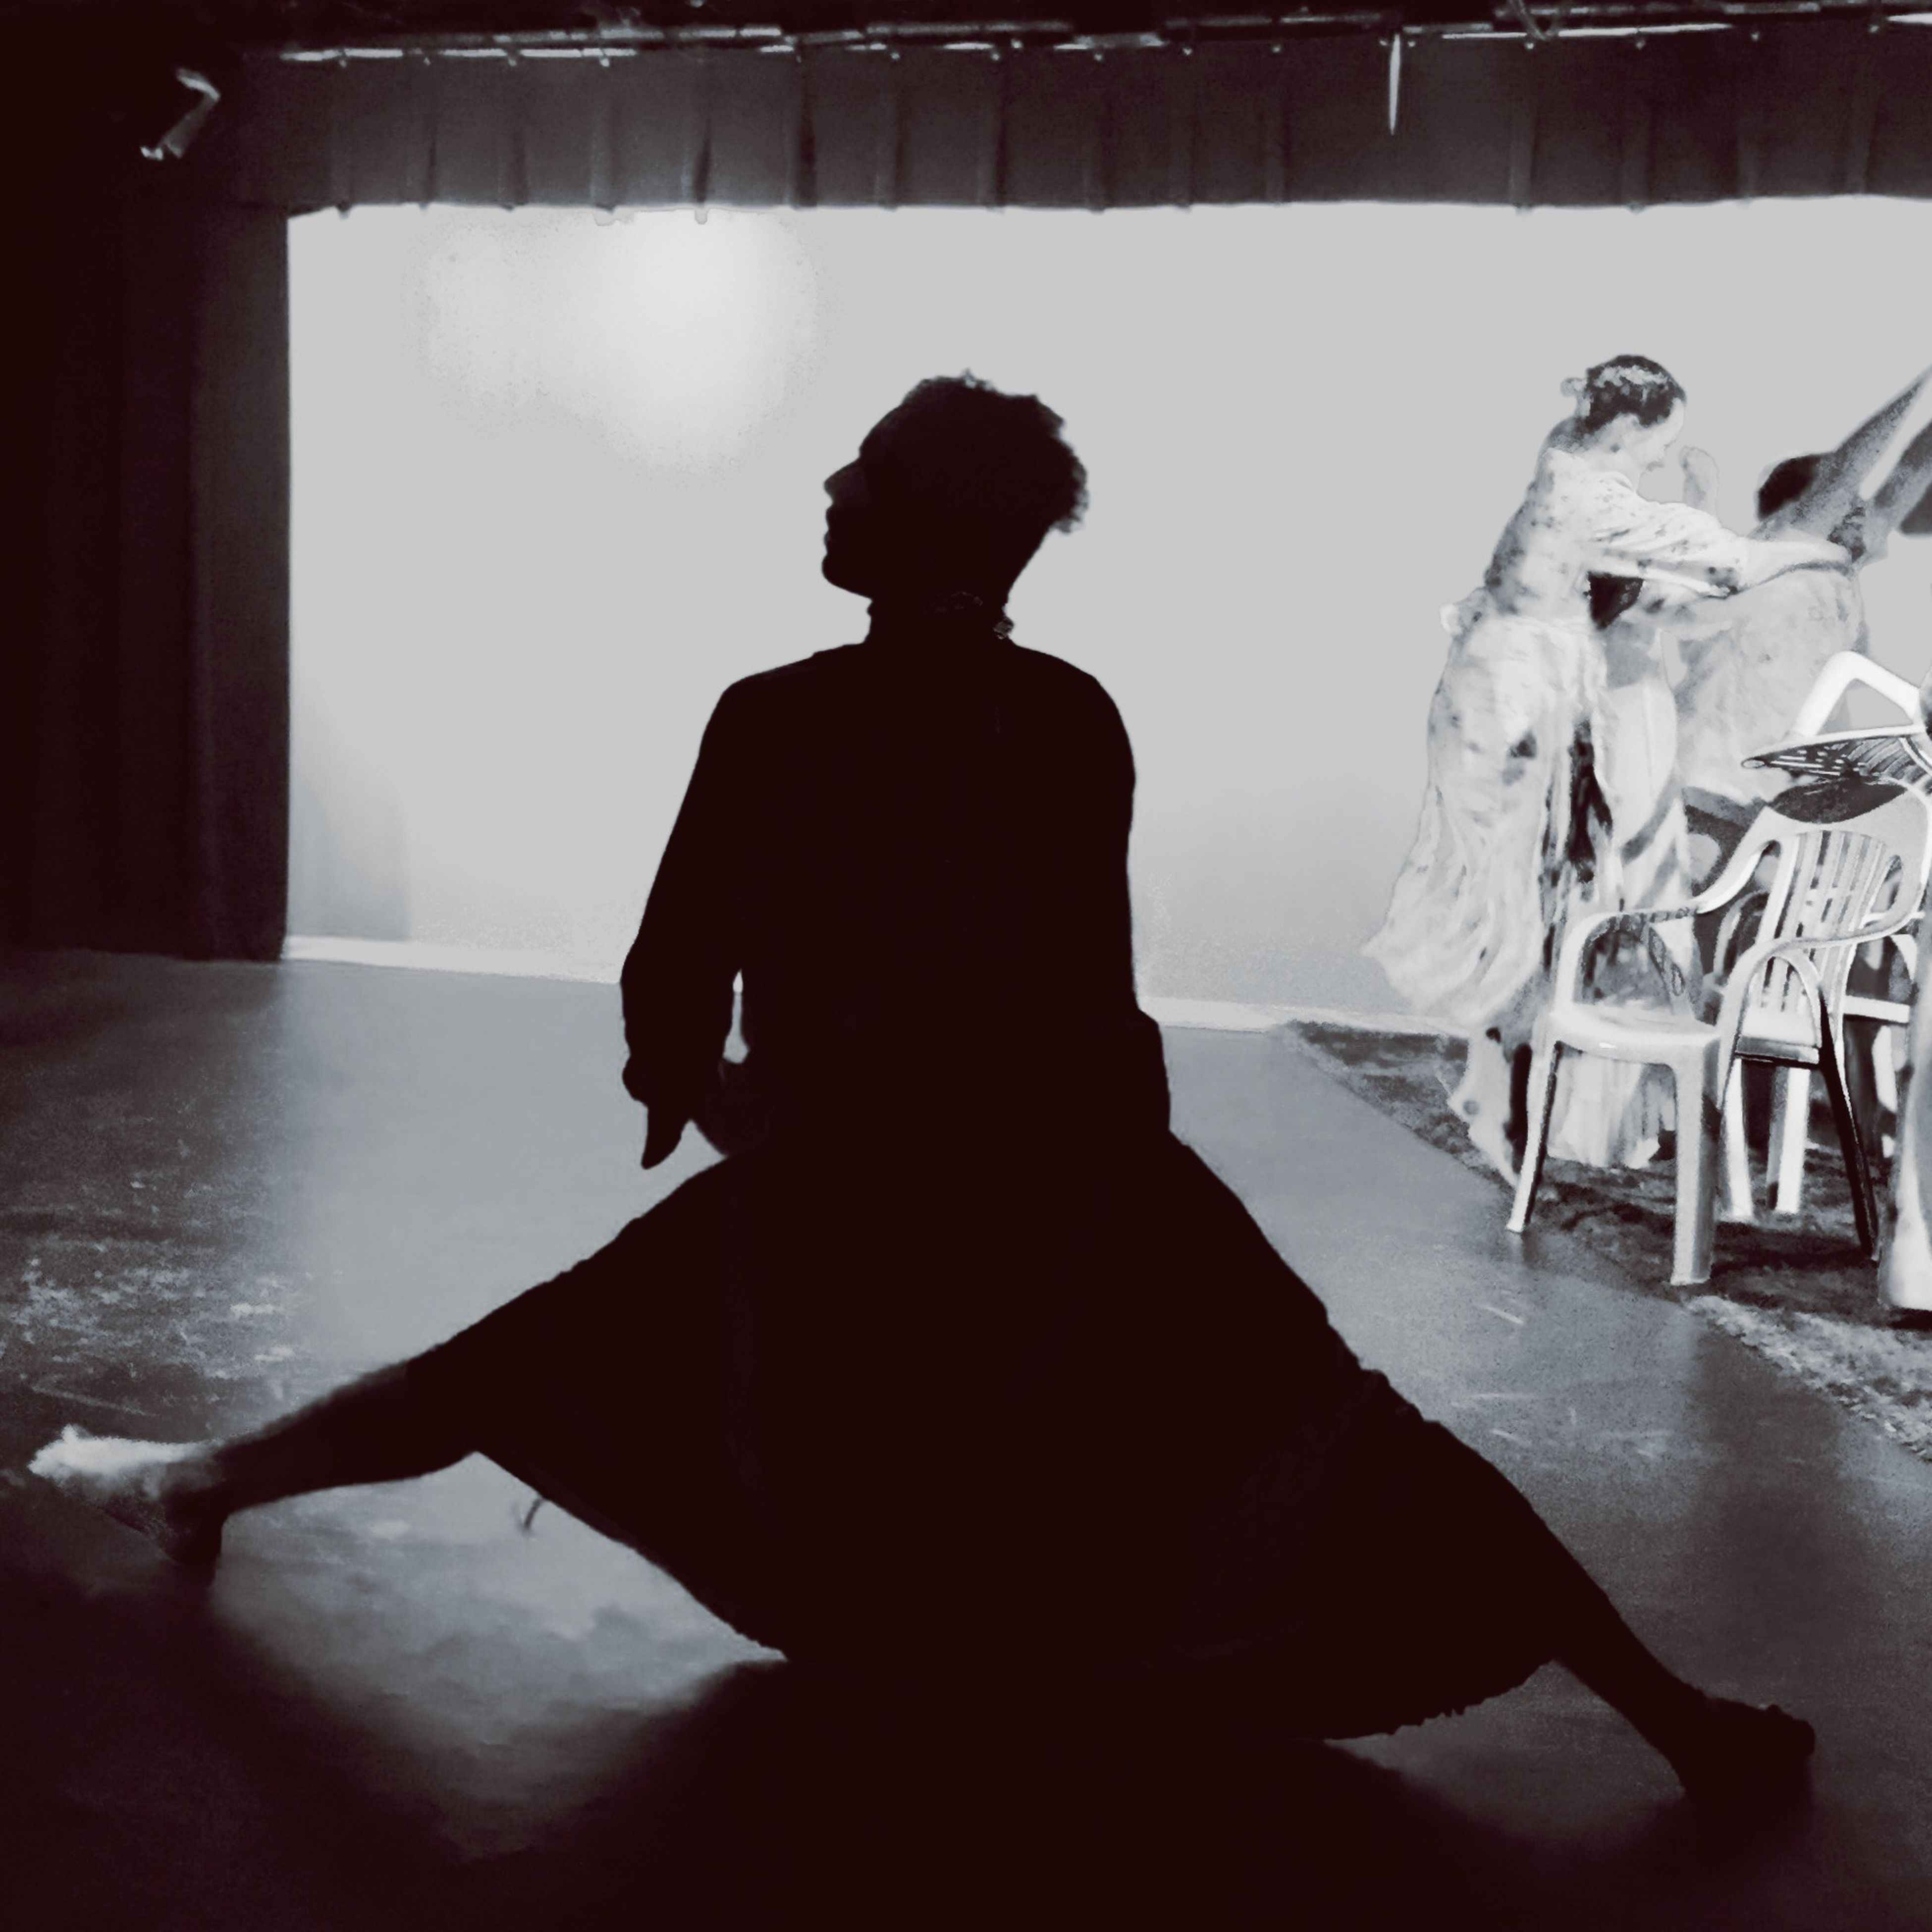 Silhouette Arts Culture And Entertainment Dallas Theater DGDGDanceGroup DGDGWarflower BathHouseCulturalCenter